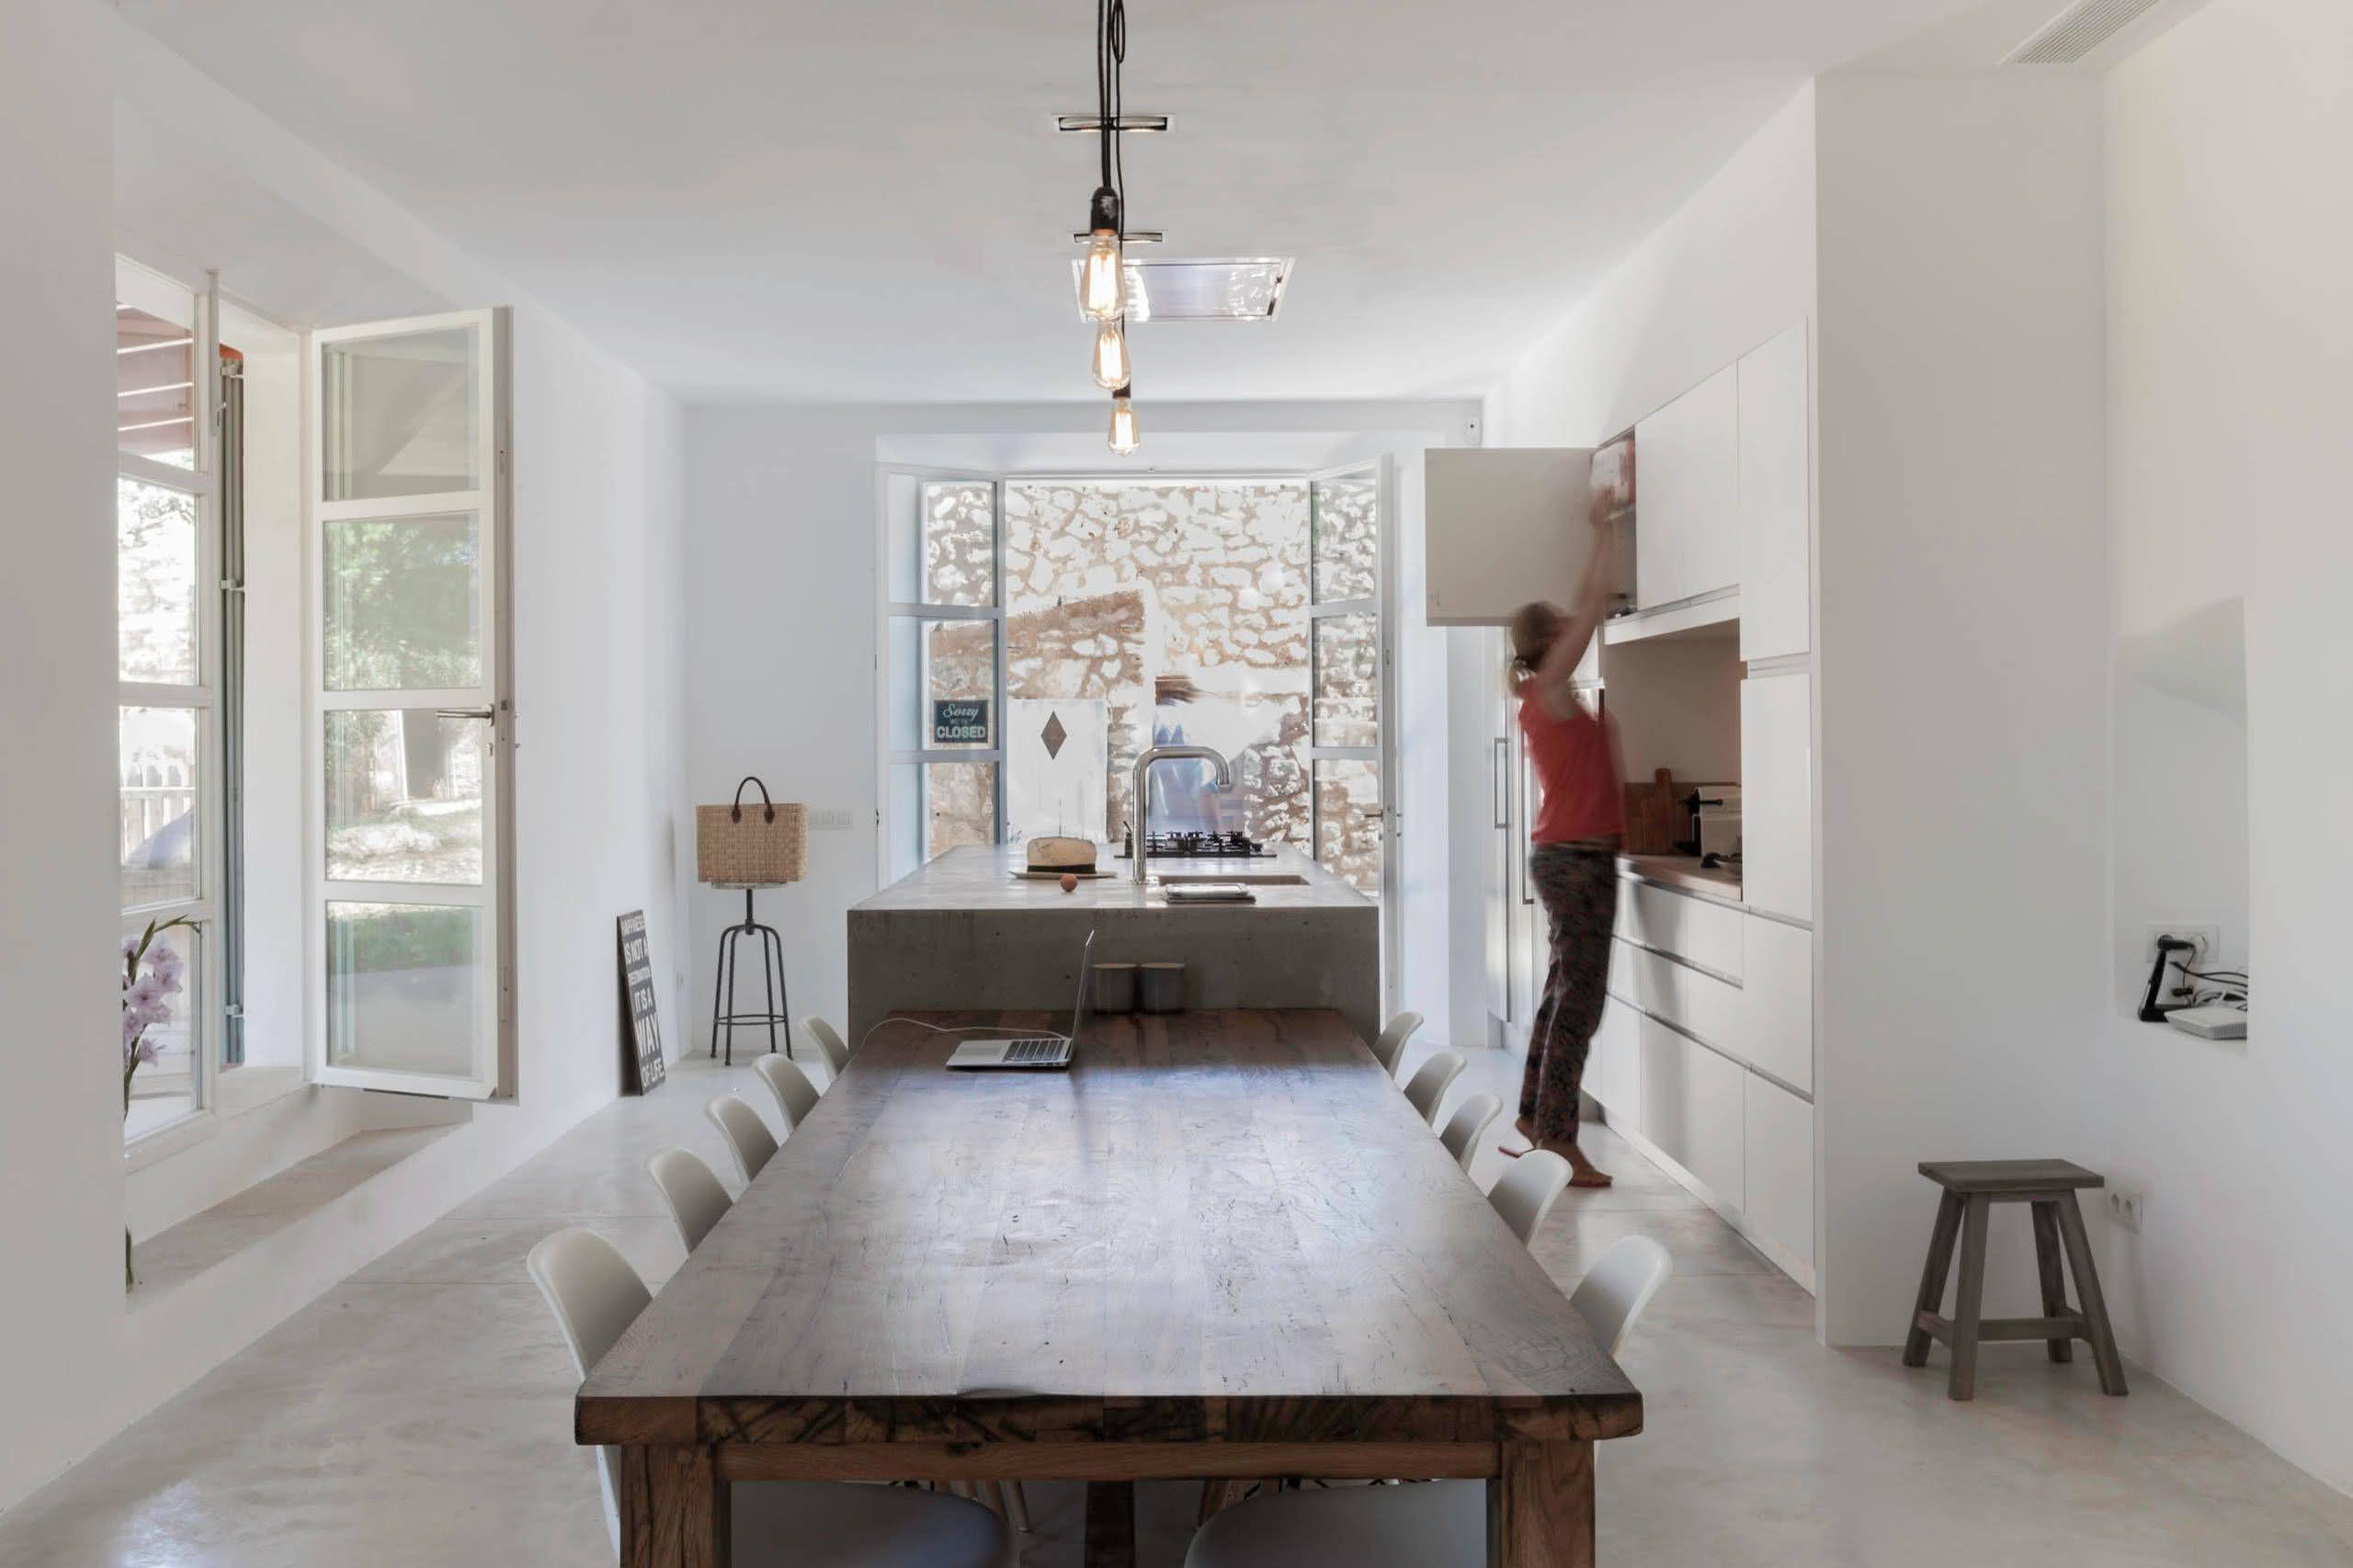 Proposta de ilha central de concreto com mesa de madeira anexada